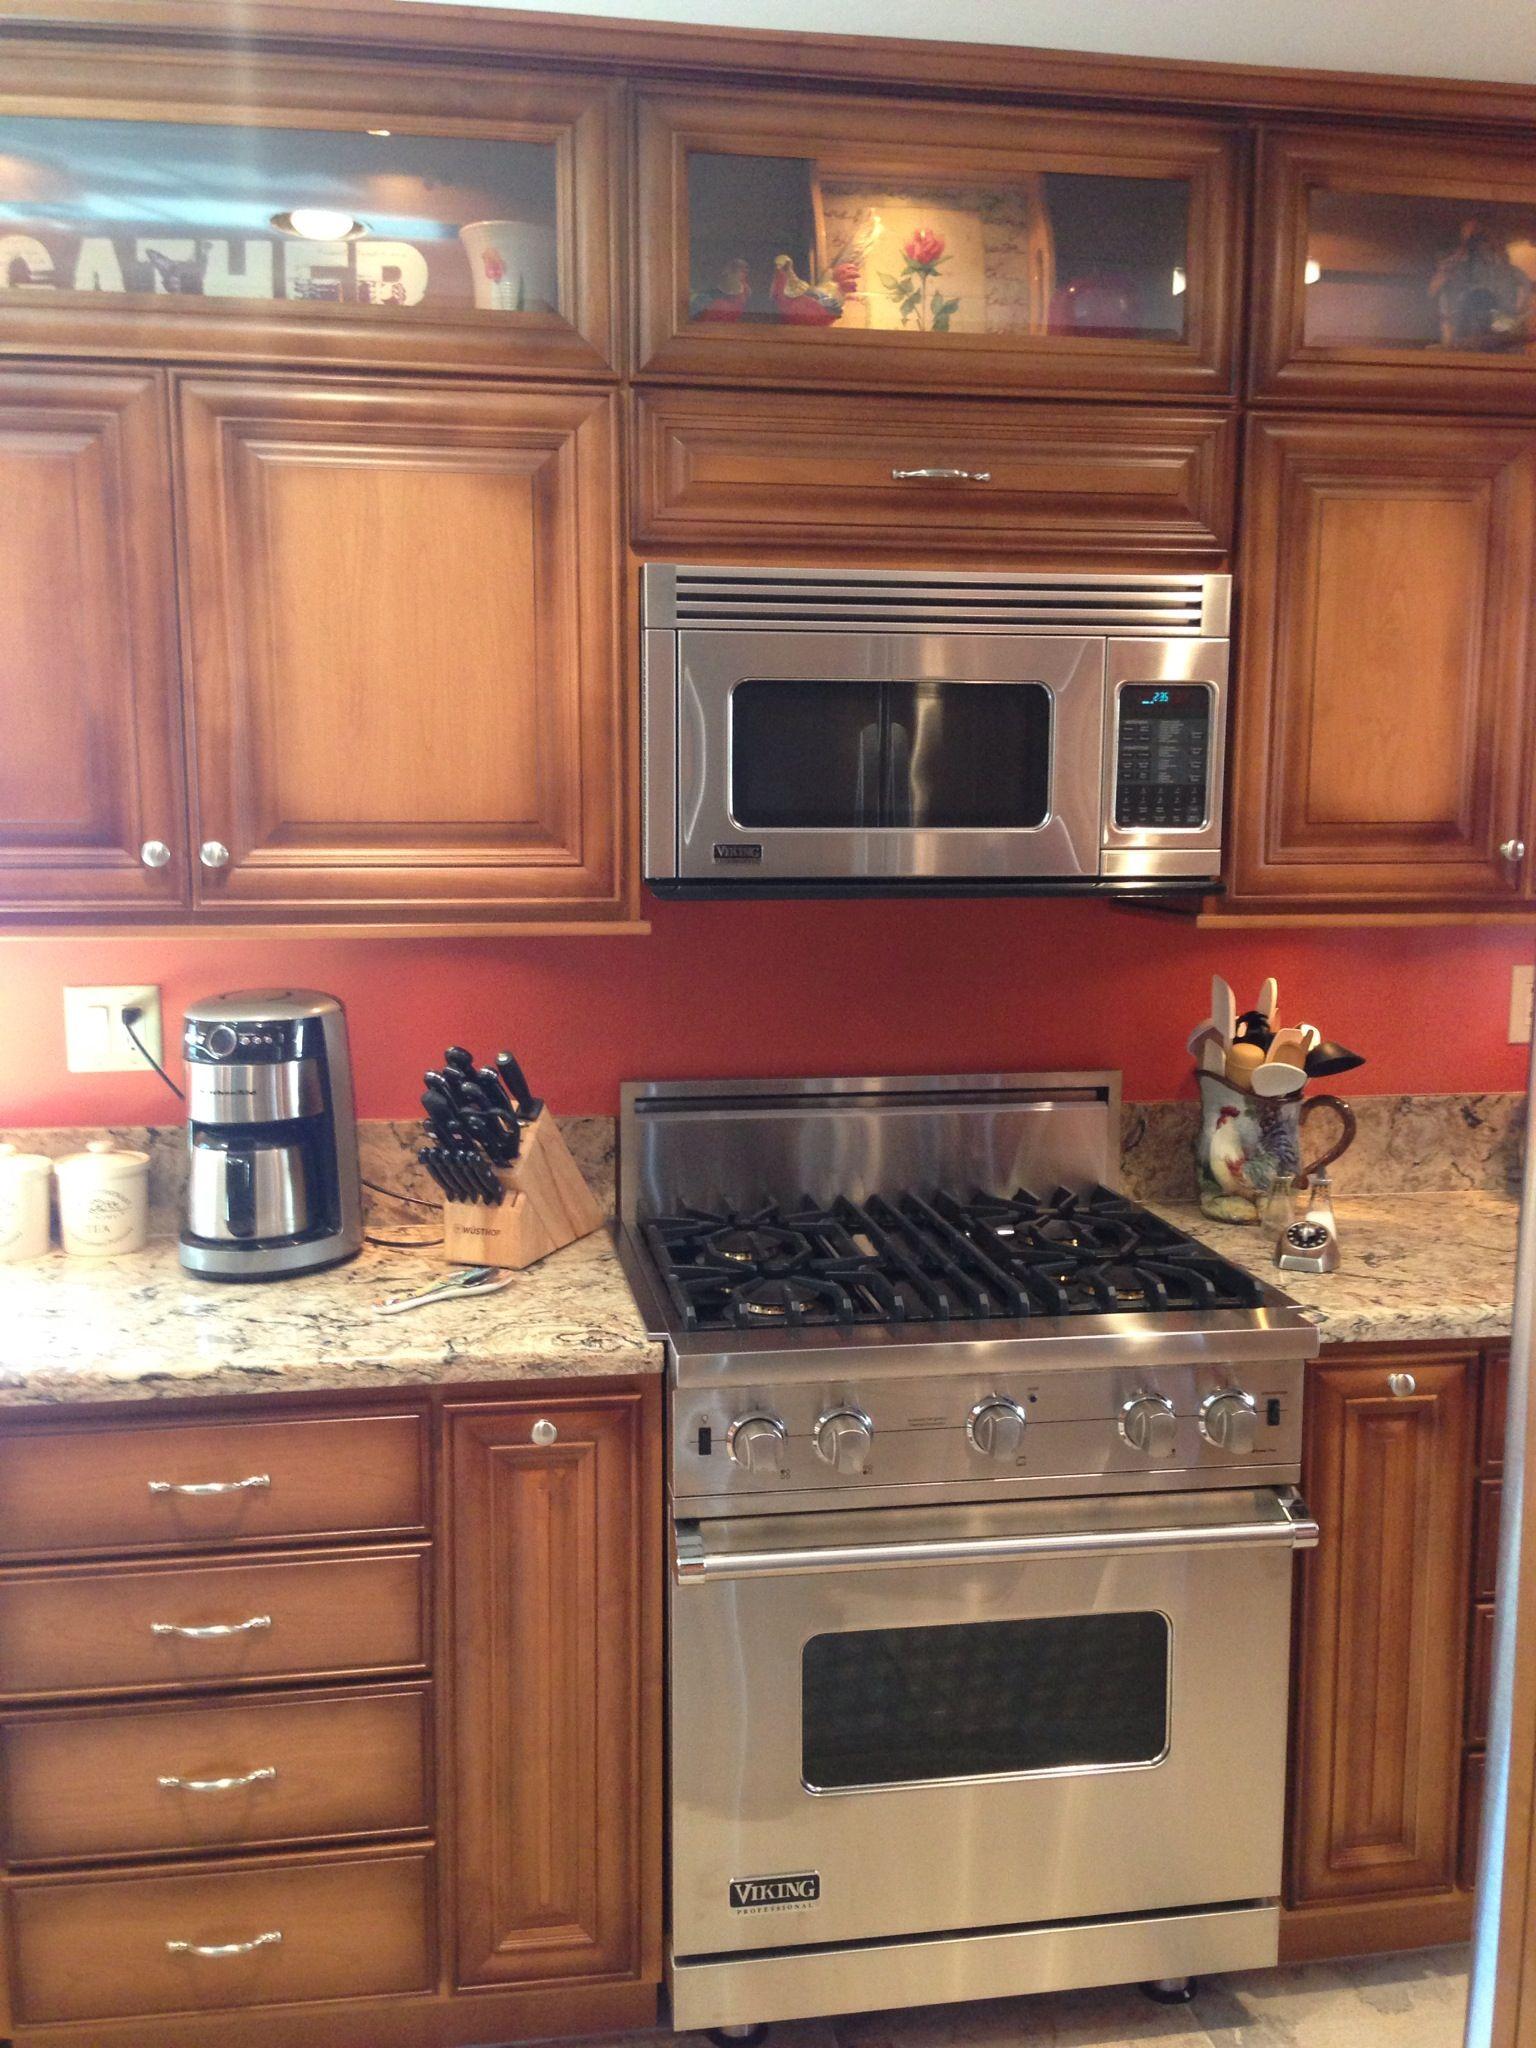 Cambria clyde kitchen and bathroom countertop color - Bath Viking Range Cambria Quartz Bradshaw